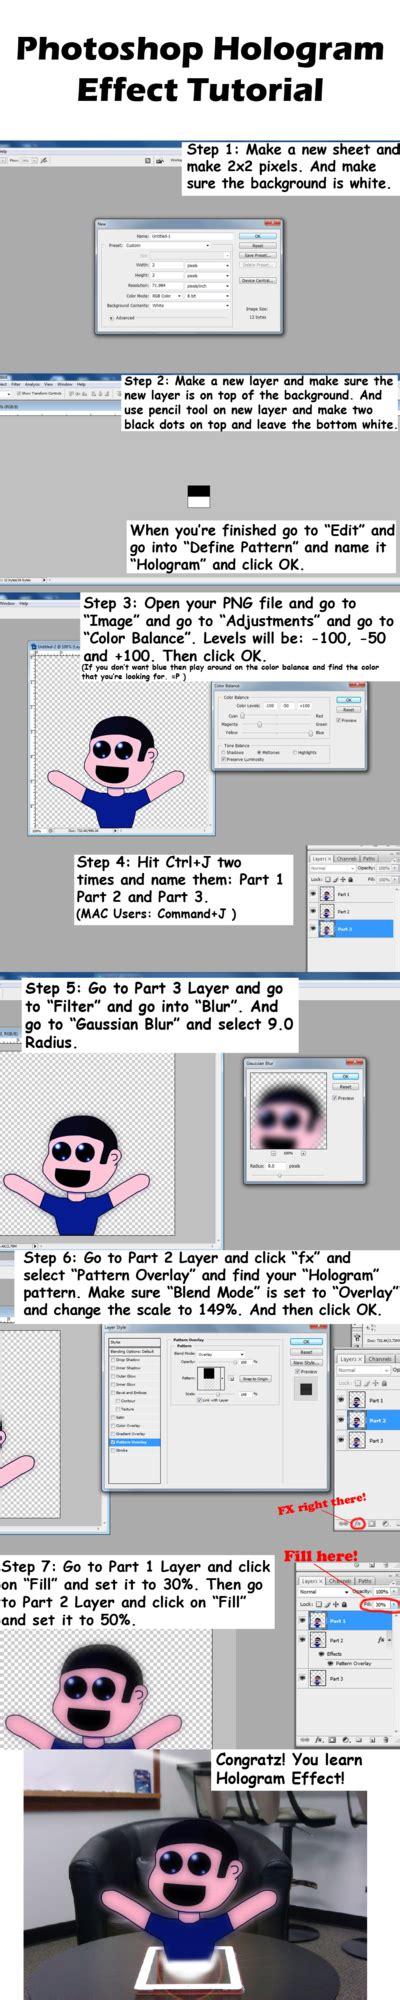 tutorial photoshop hologram photoshop hologram effect tutorial by chaviso2 on deviantart